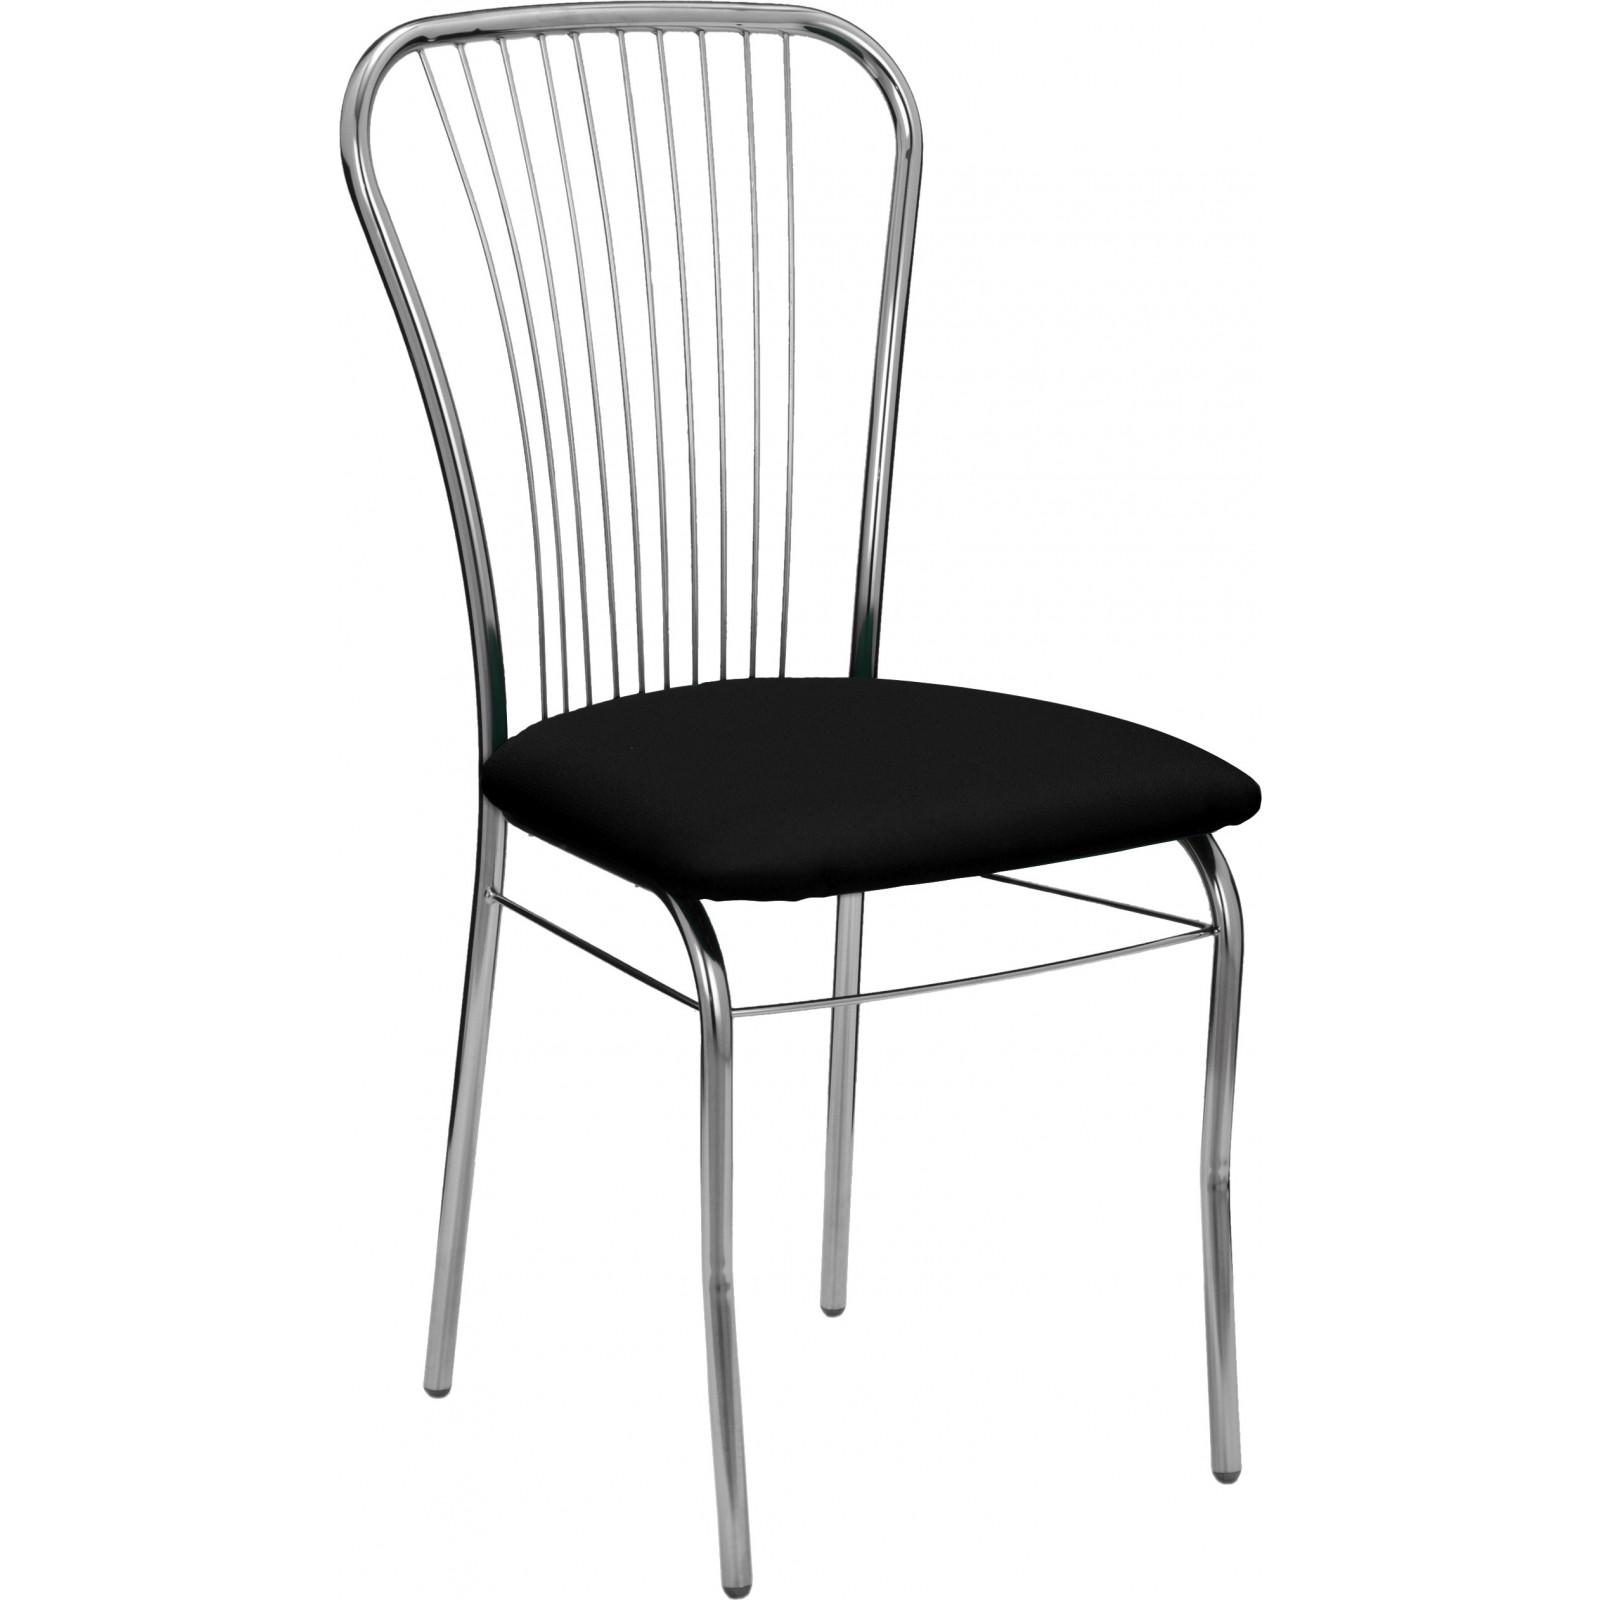 art metal furniture (amf) AMF Цезарь хром Неаполь N-20 (050646)